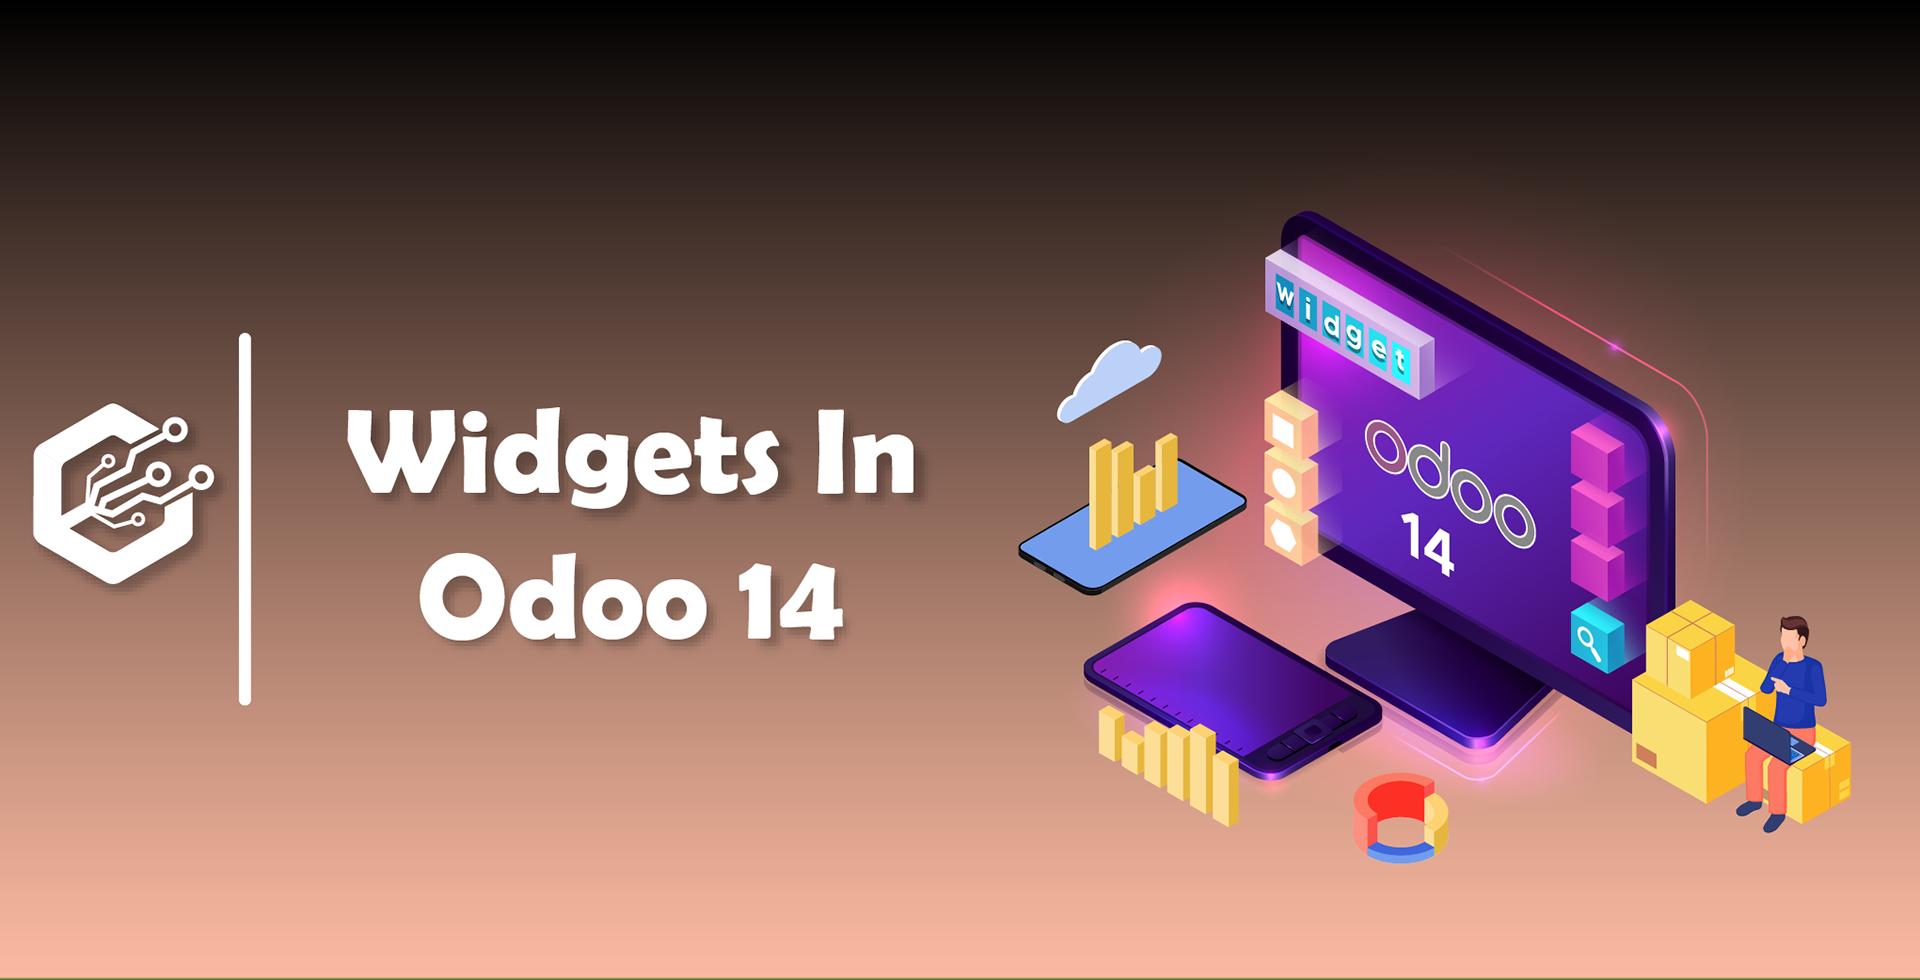 Widgets In Odoo 14